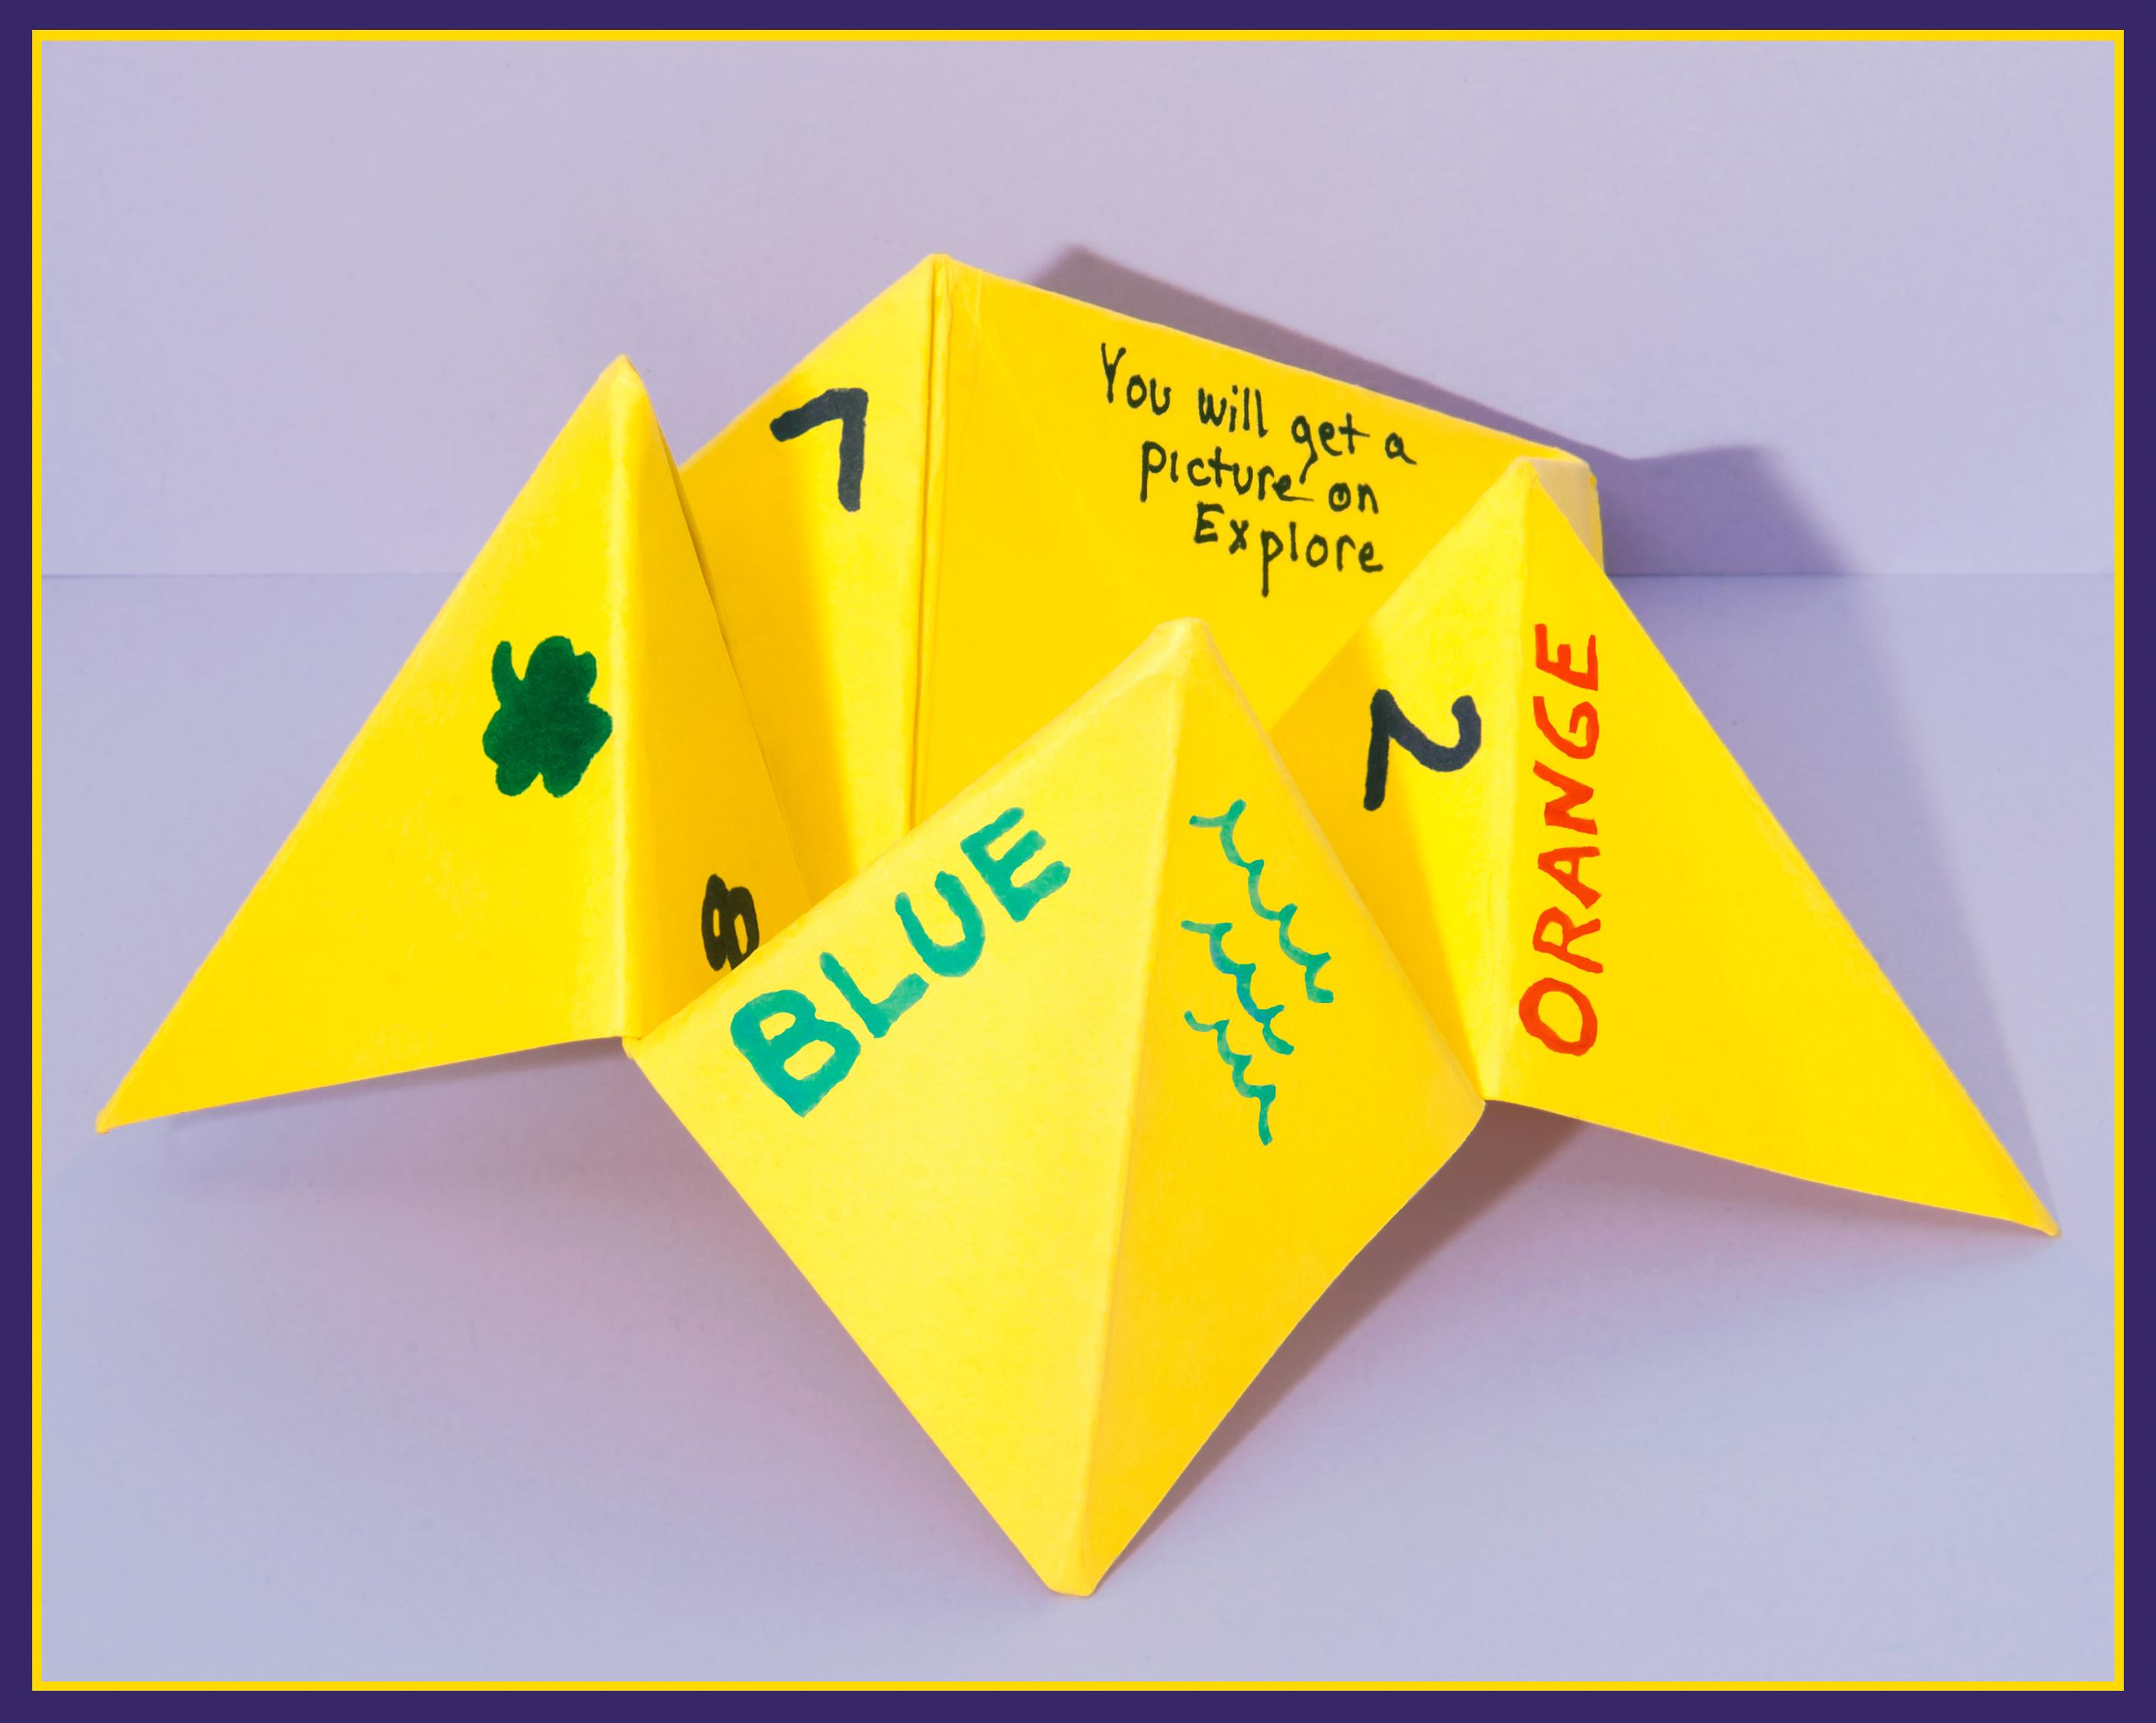 Gambar ungu iklan obyek warna warni kuning kertas mainan ungu iklan obyek warna warni kuning kertas mainan merek produk fon seni nomor segi tiga ccuart Images